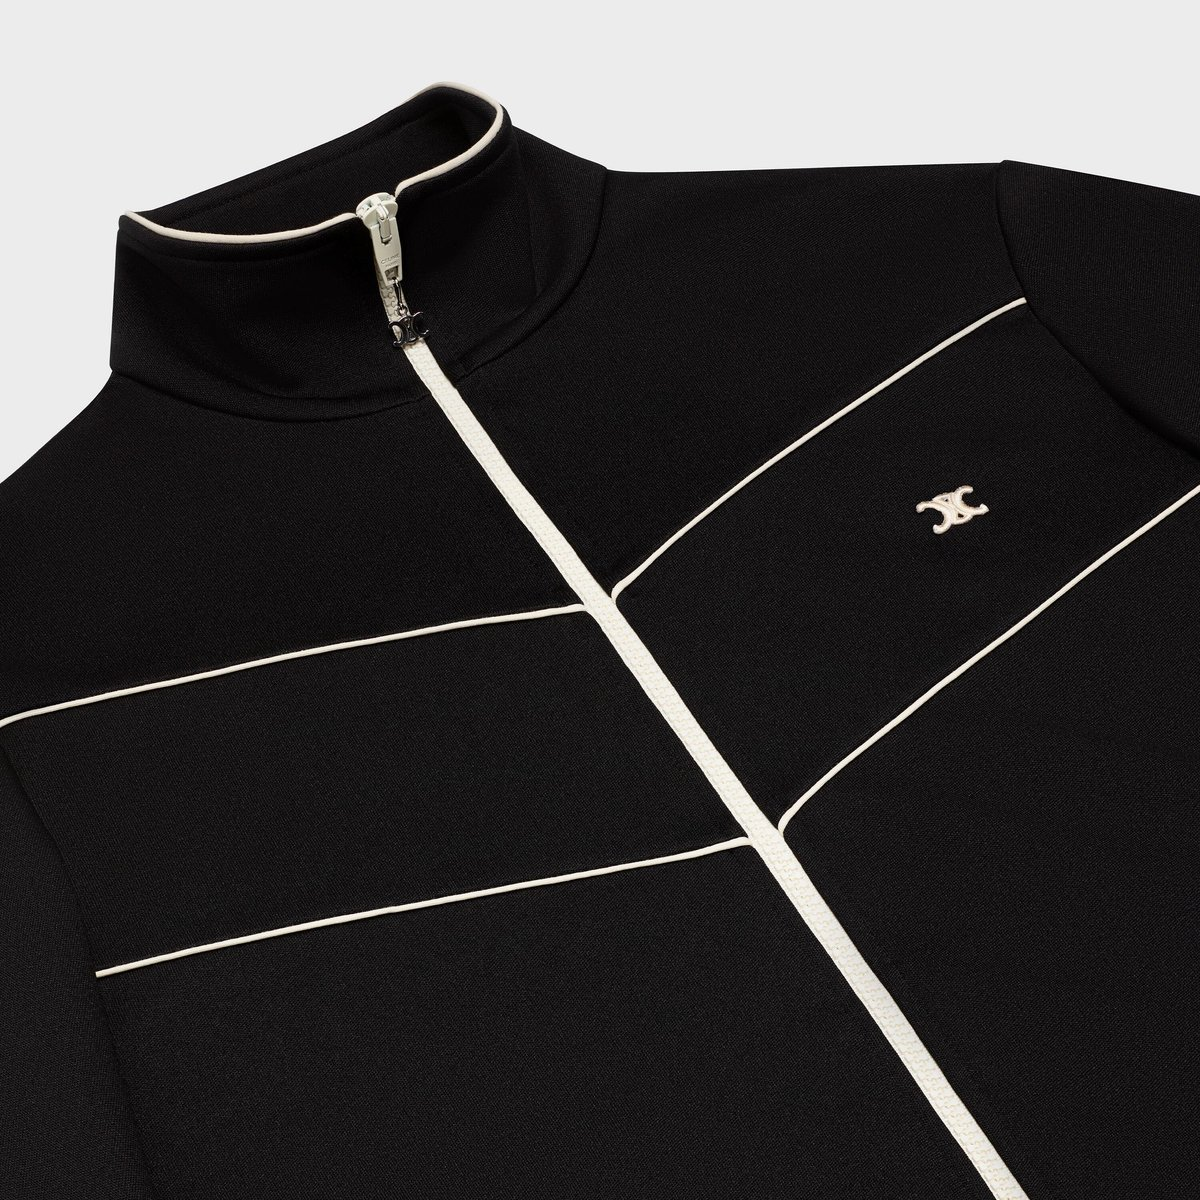 celine_triomphe_sweater_details.jpg